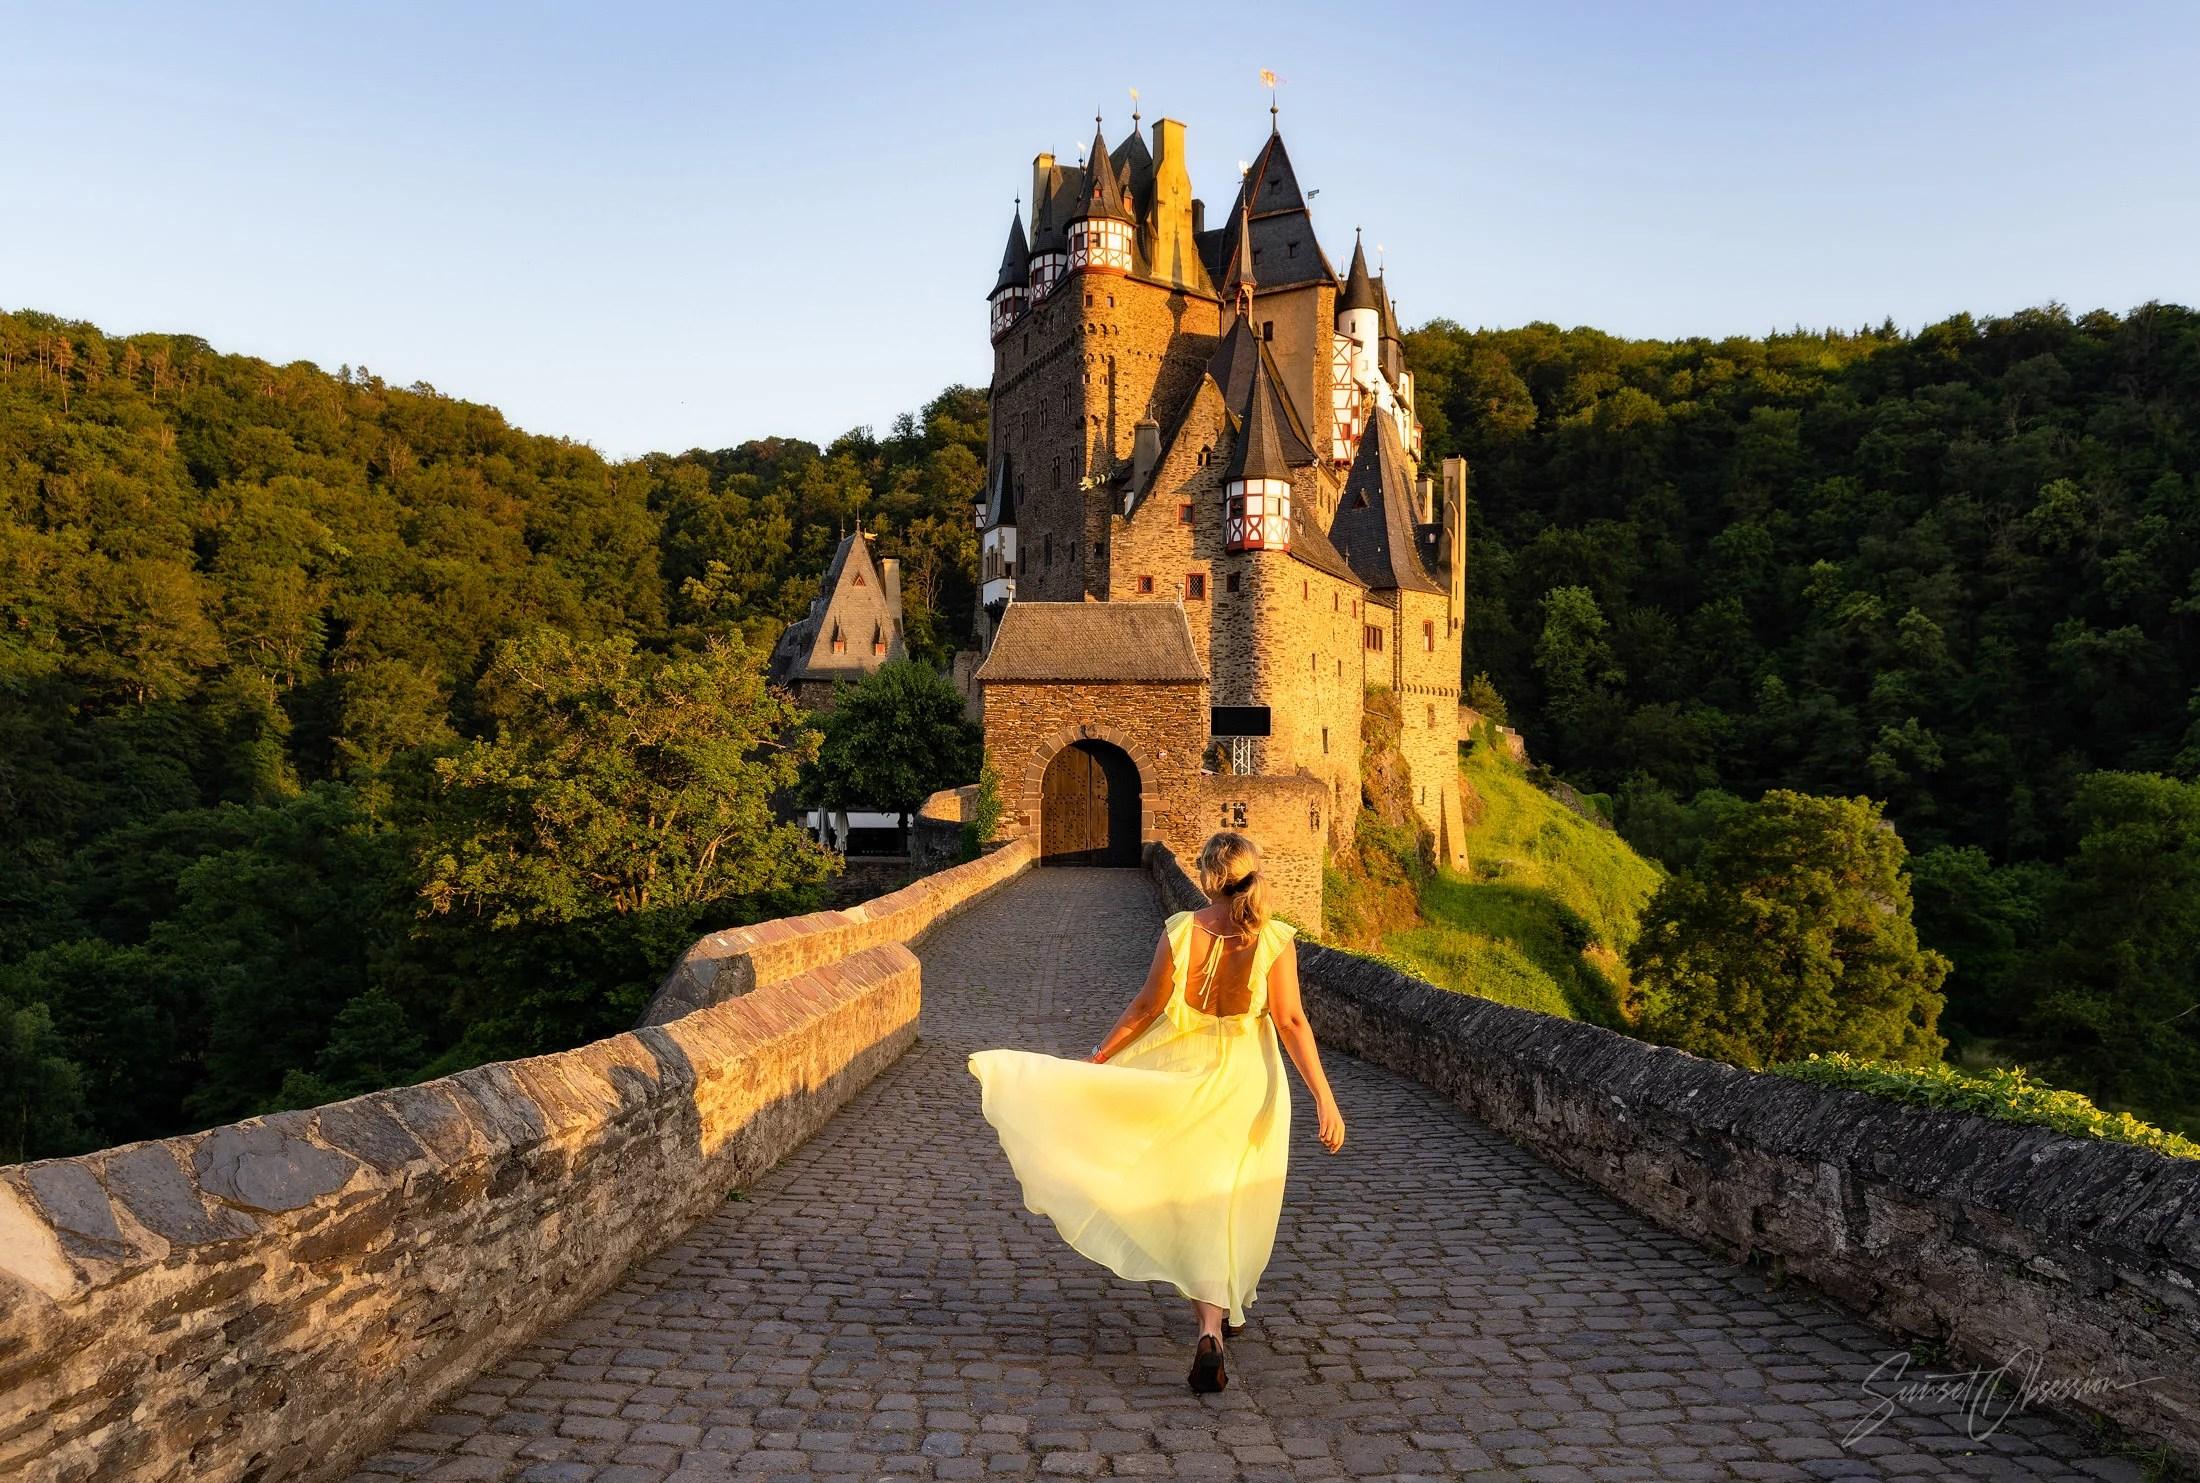 Model photography at Burg Eltz